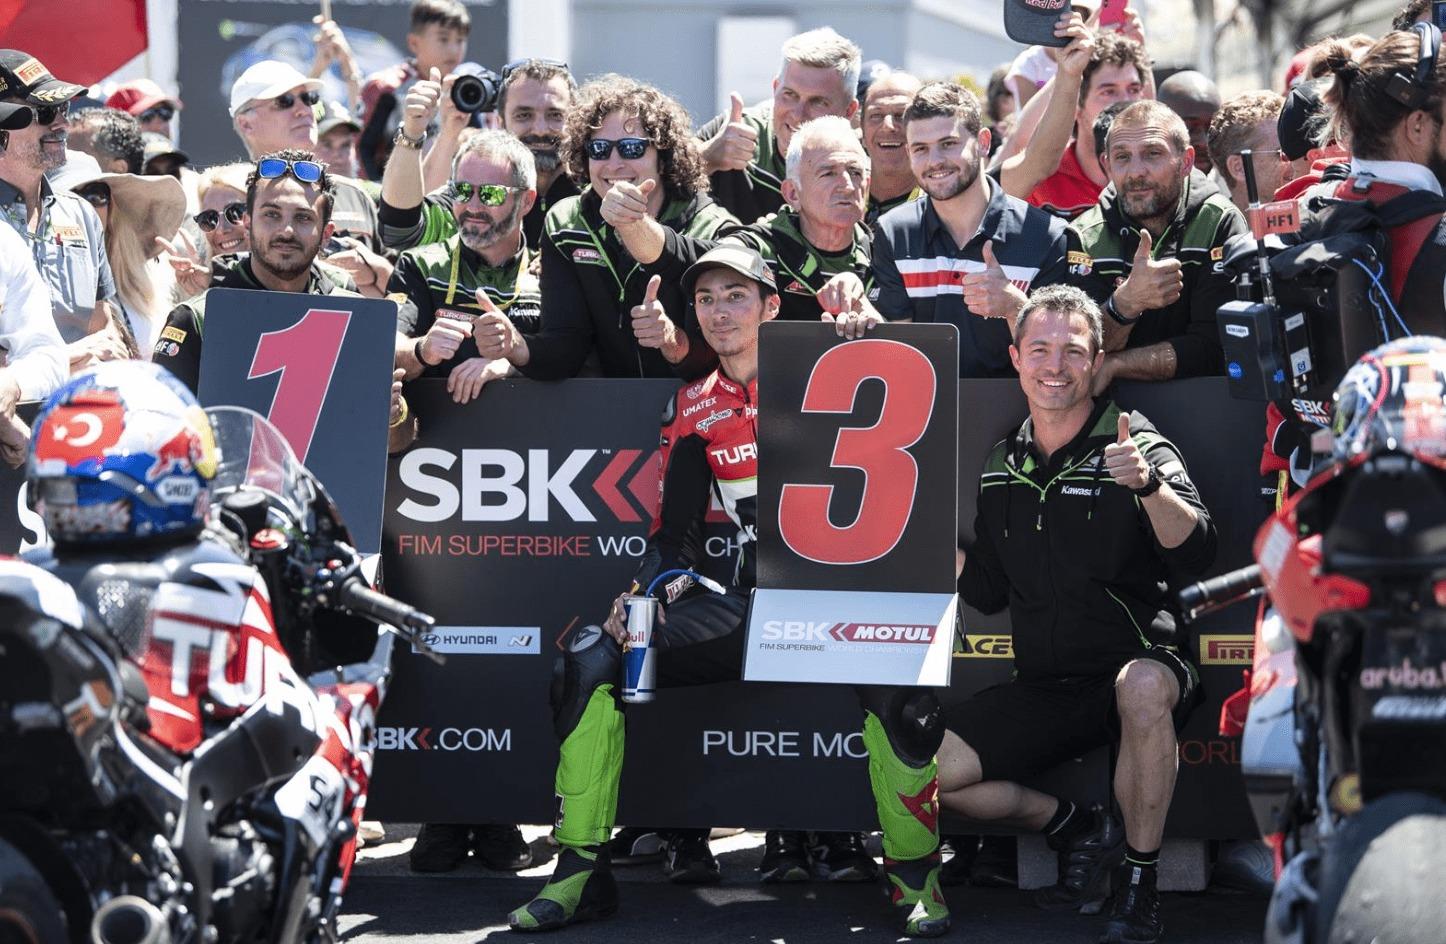 SBK第9戦ラグナ・セカ レース2 3位ラズガトリオグル「ラグナ・セカで表彰台は嬉しい結果」